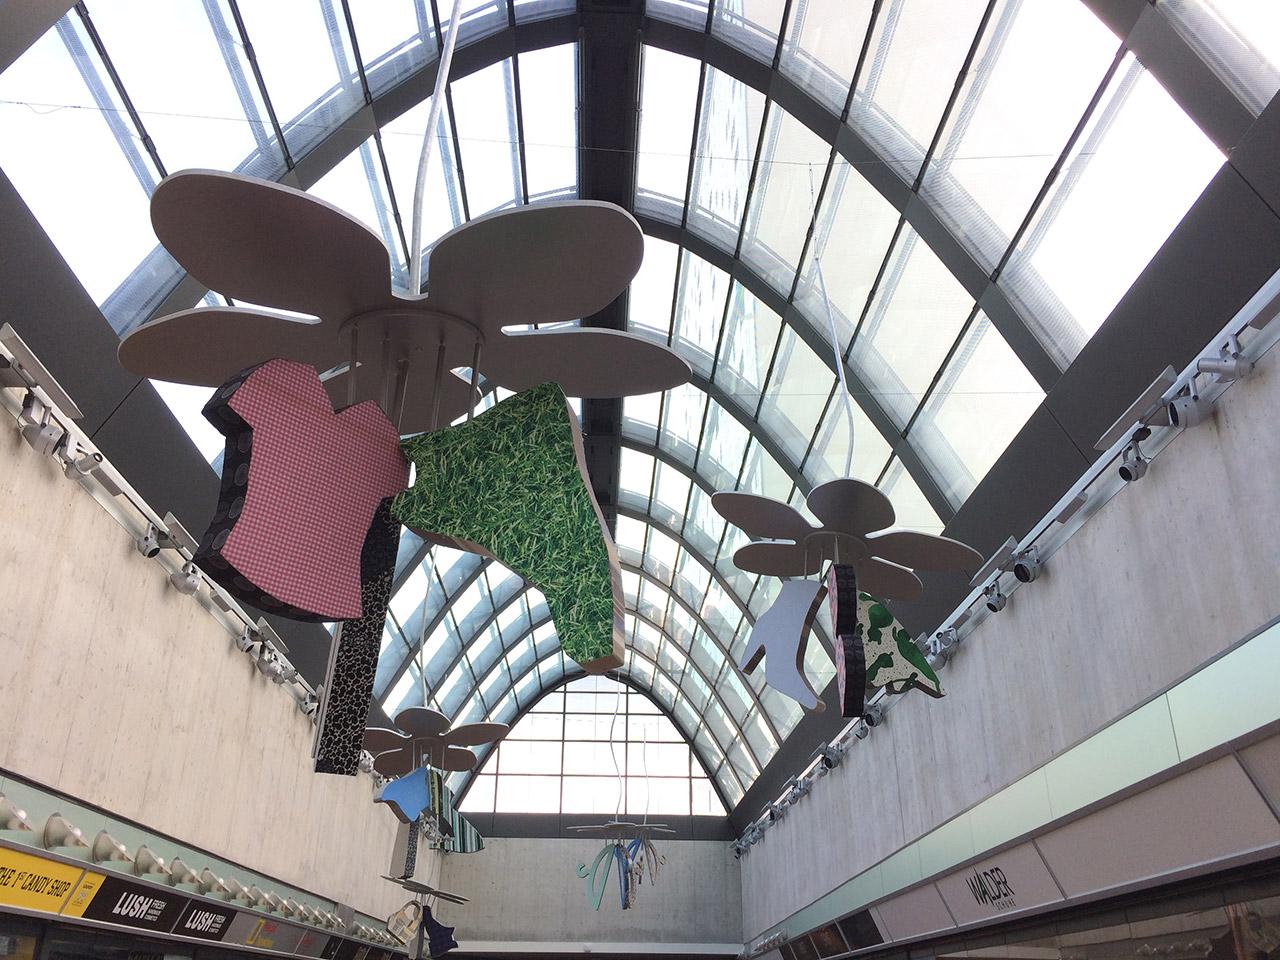 Dekobau - Dekorationsbau Shoppi Tivoli